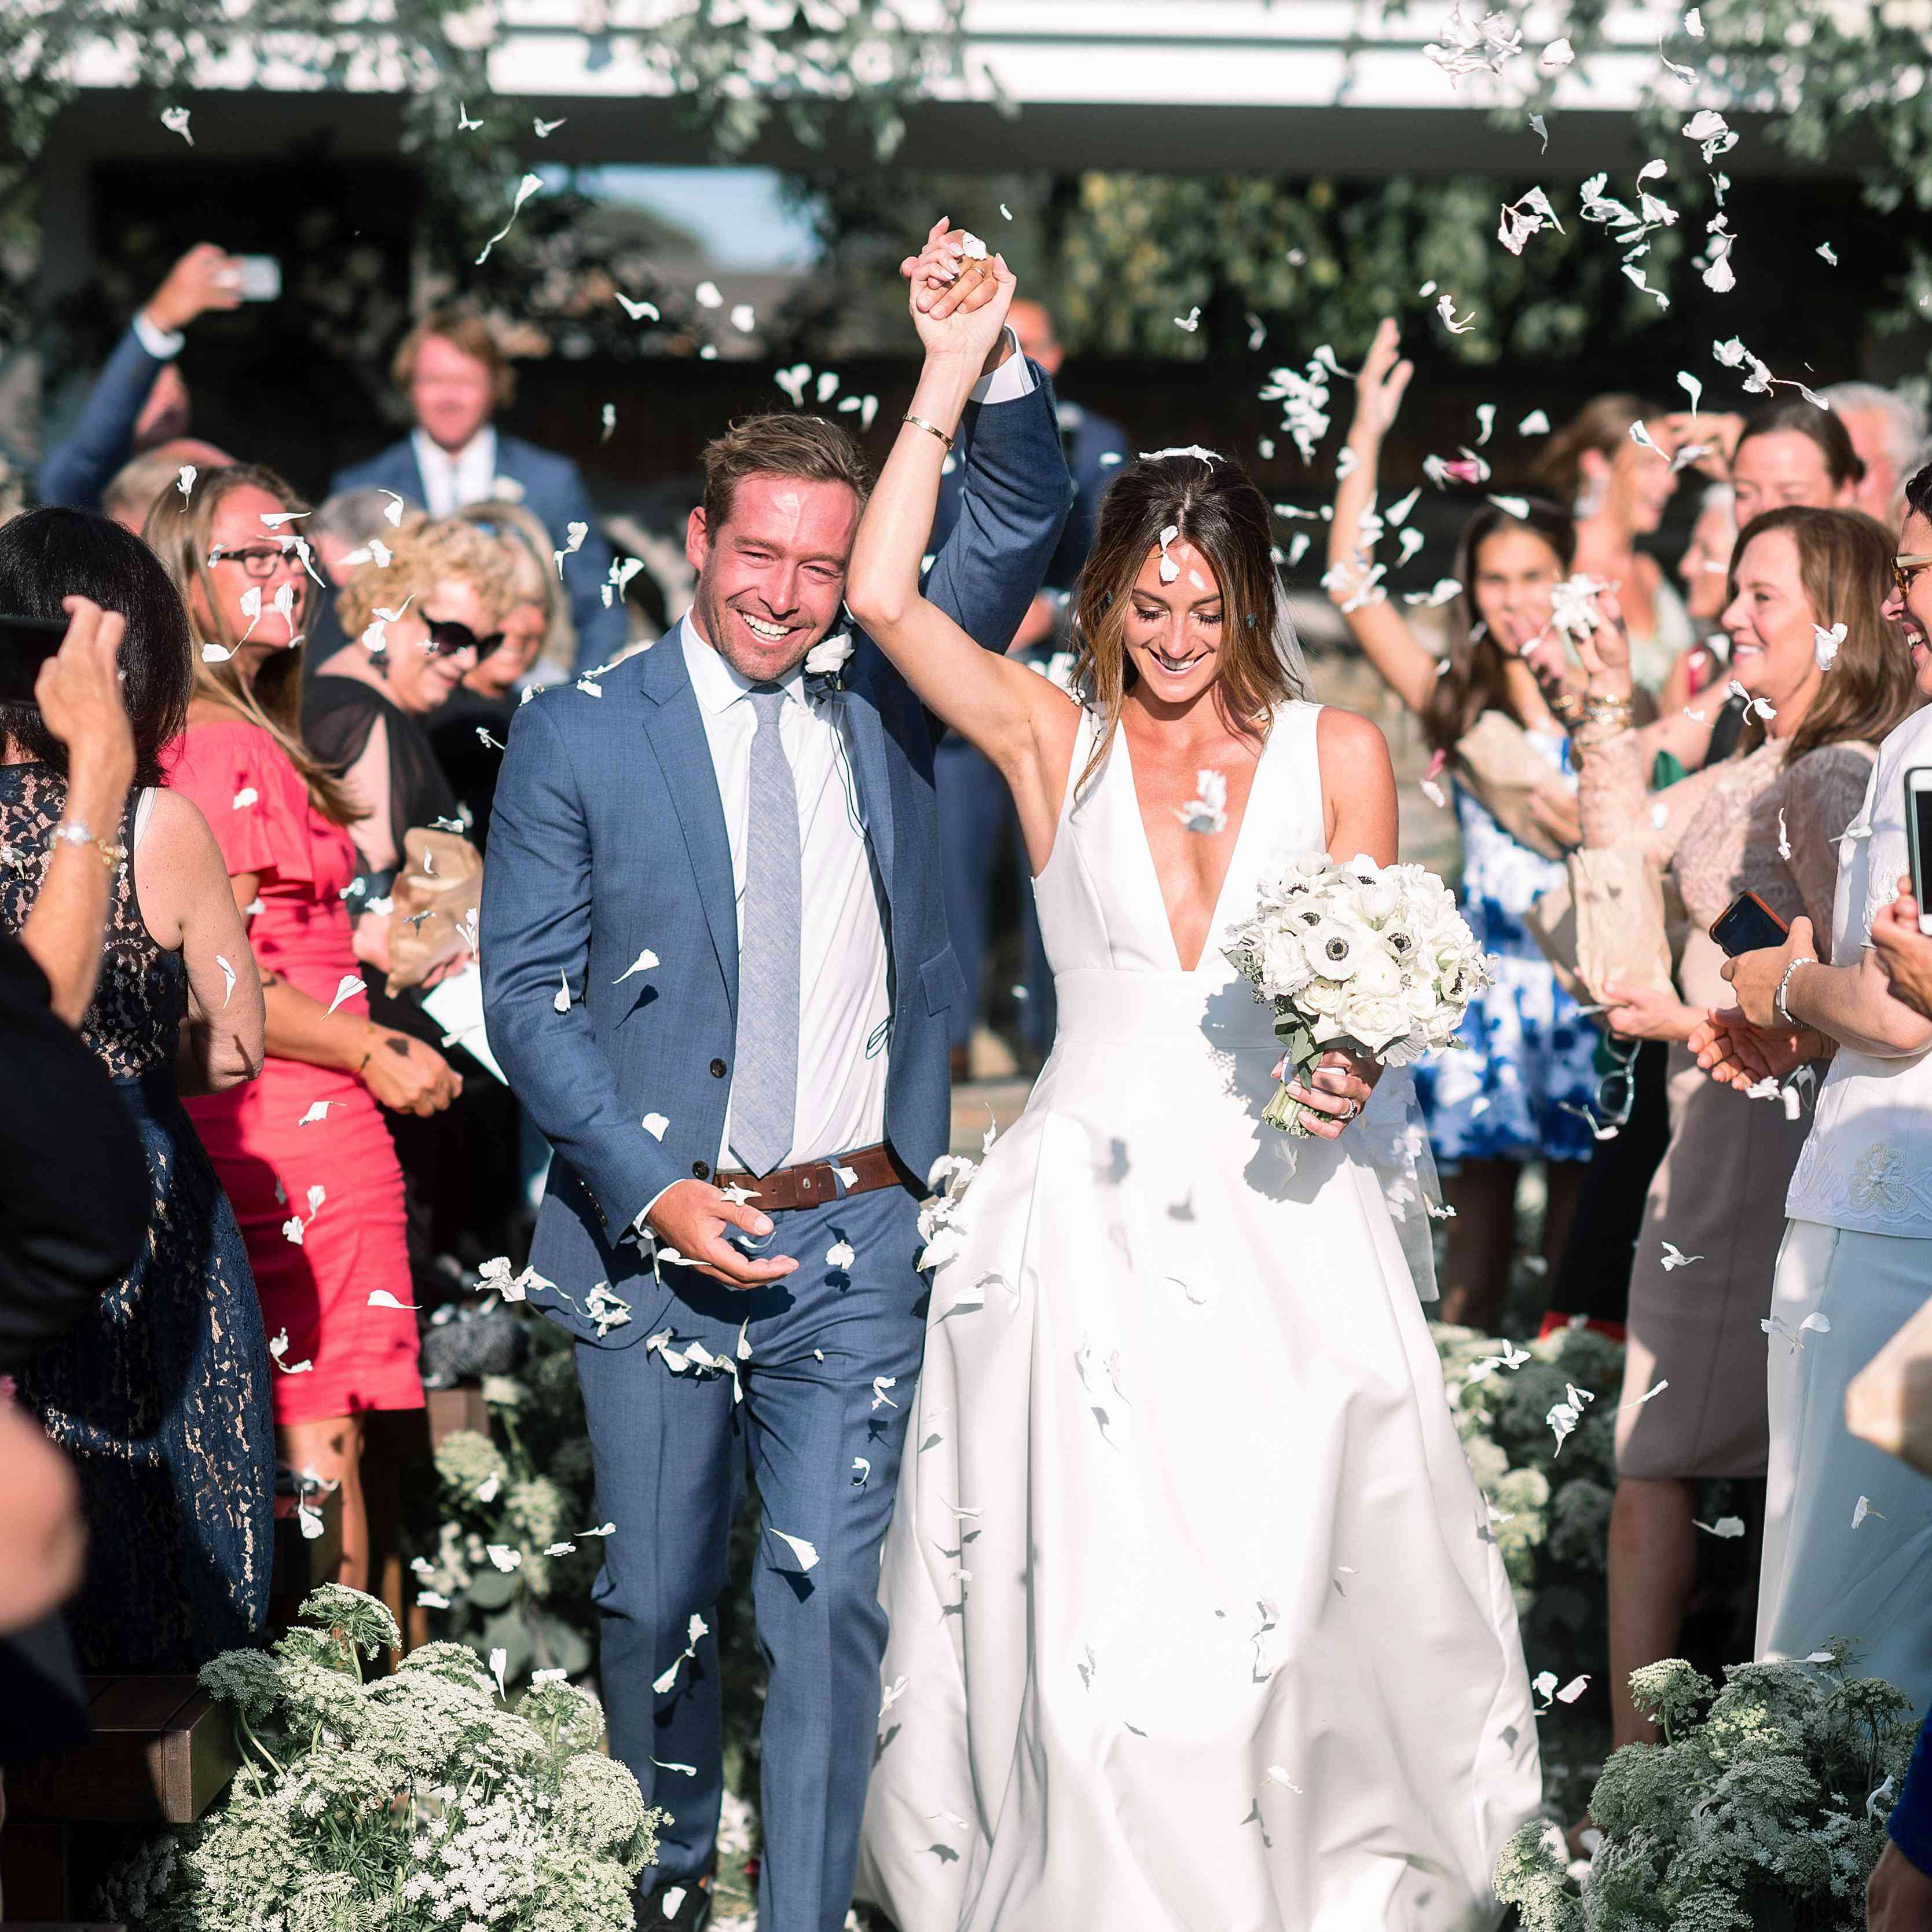 Bride and groom with white confetti